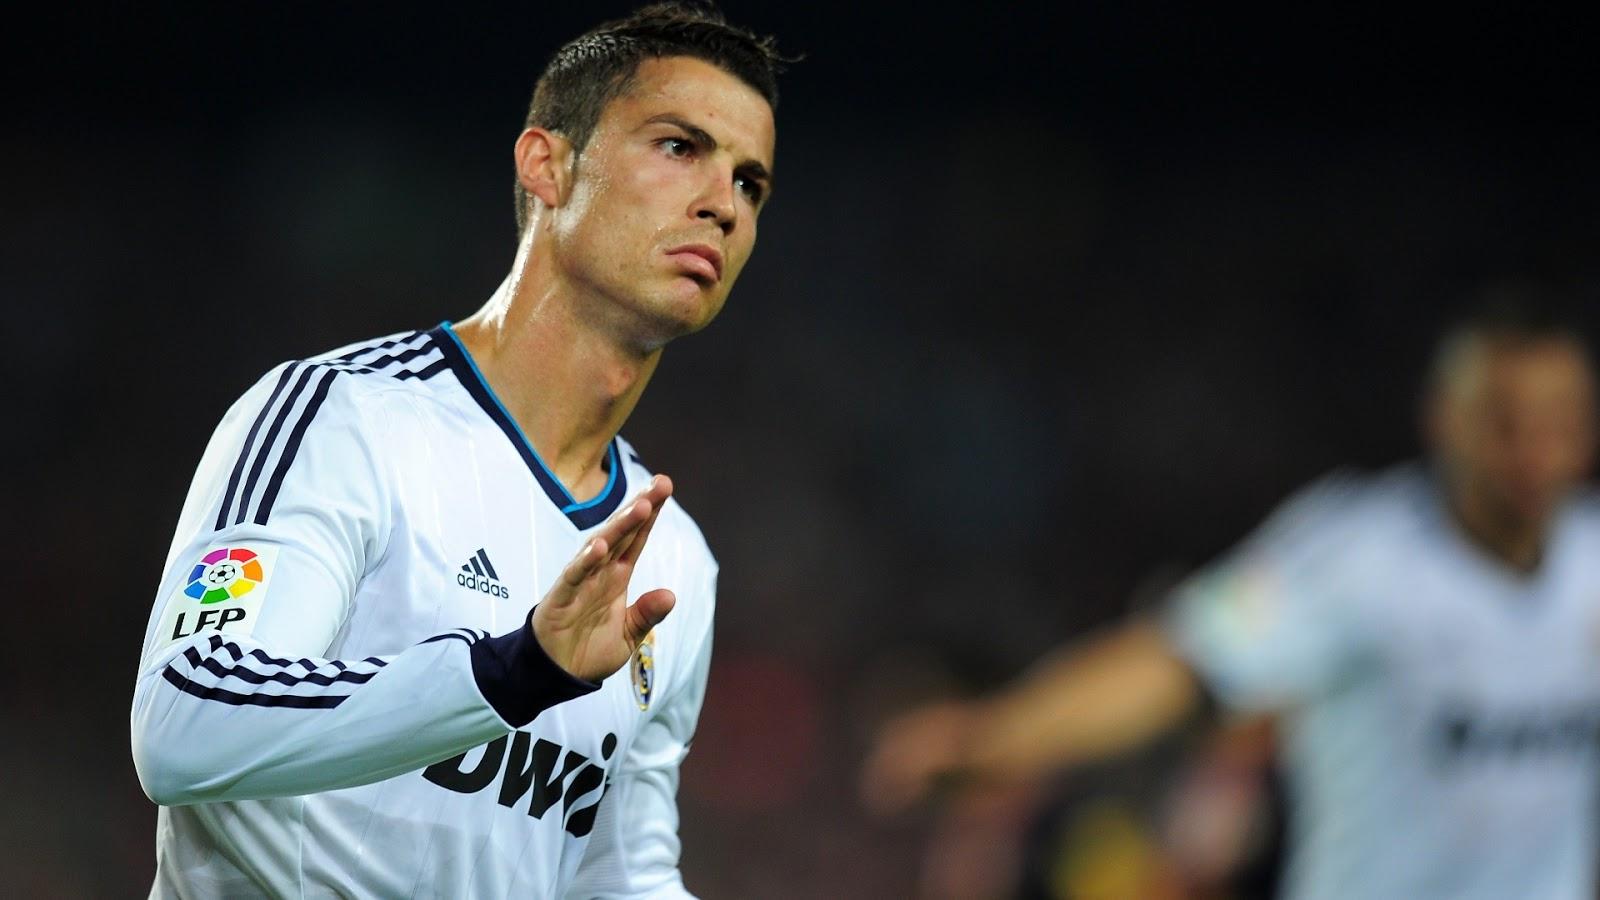 Vídeo: proposta da Juventus seduziu CR7